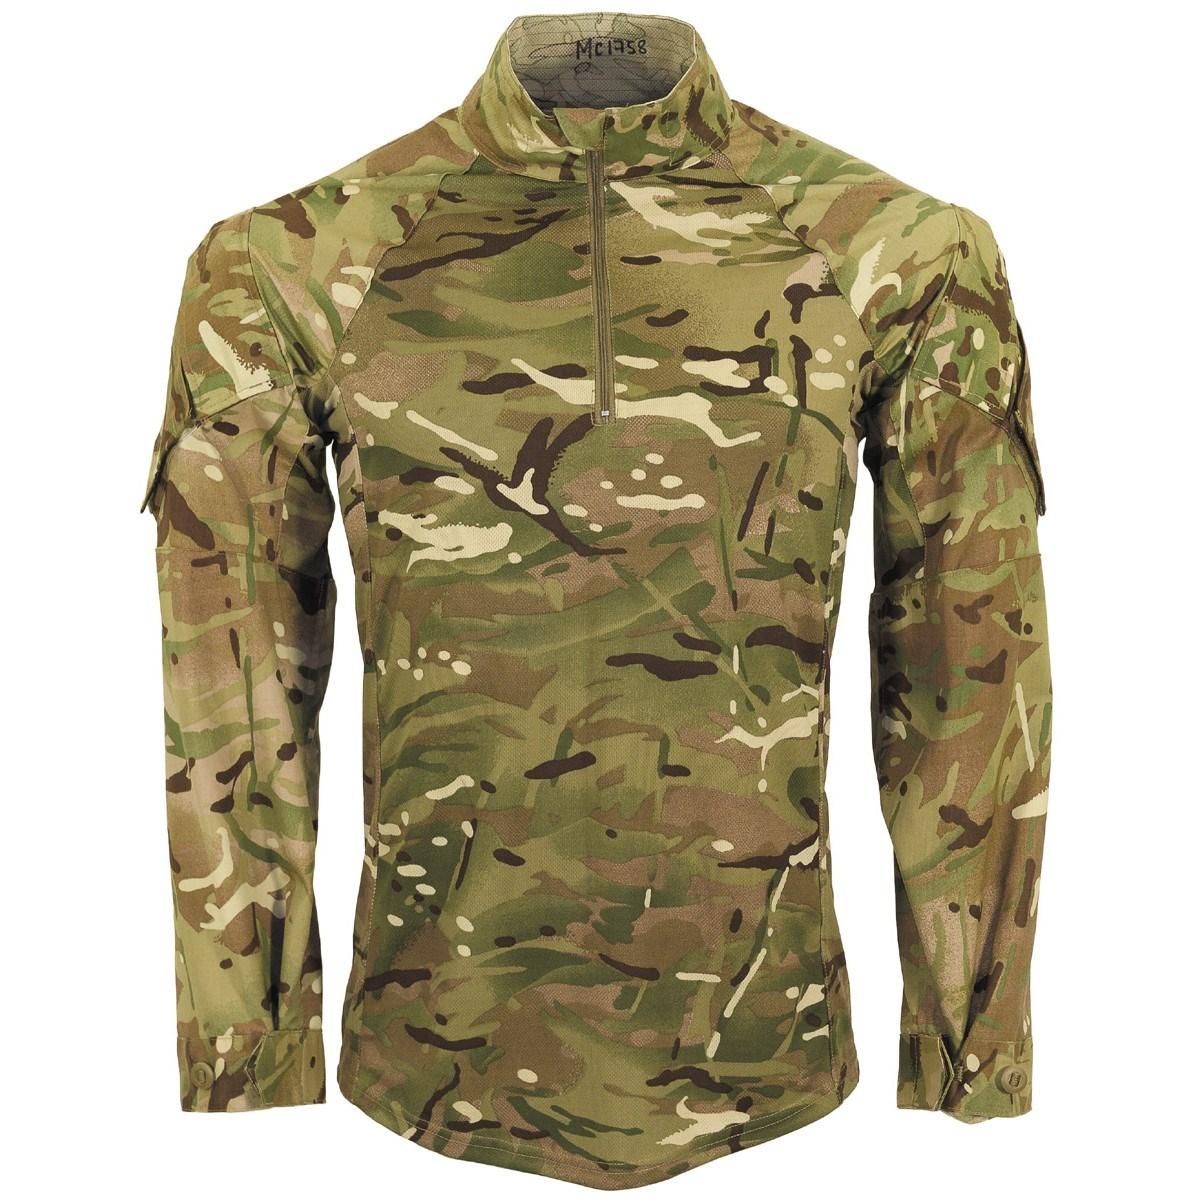 "Košile taktická britská UBAC ""Armour"" MTP CAMO original Armáda Britská 602276 L-11"